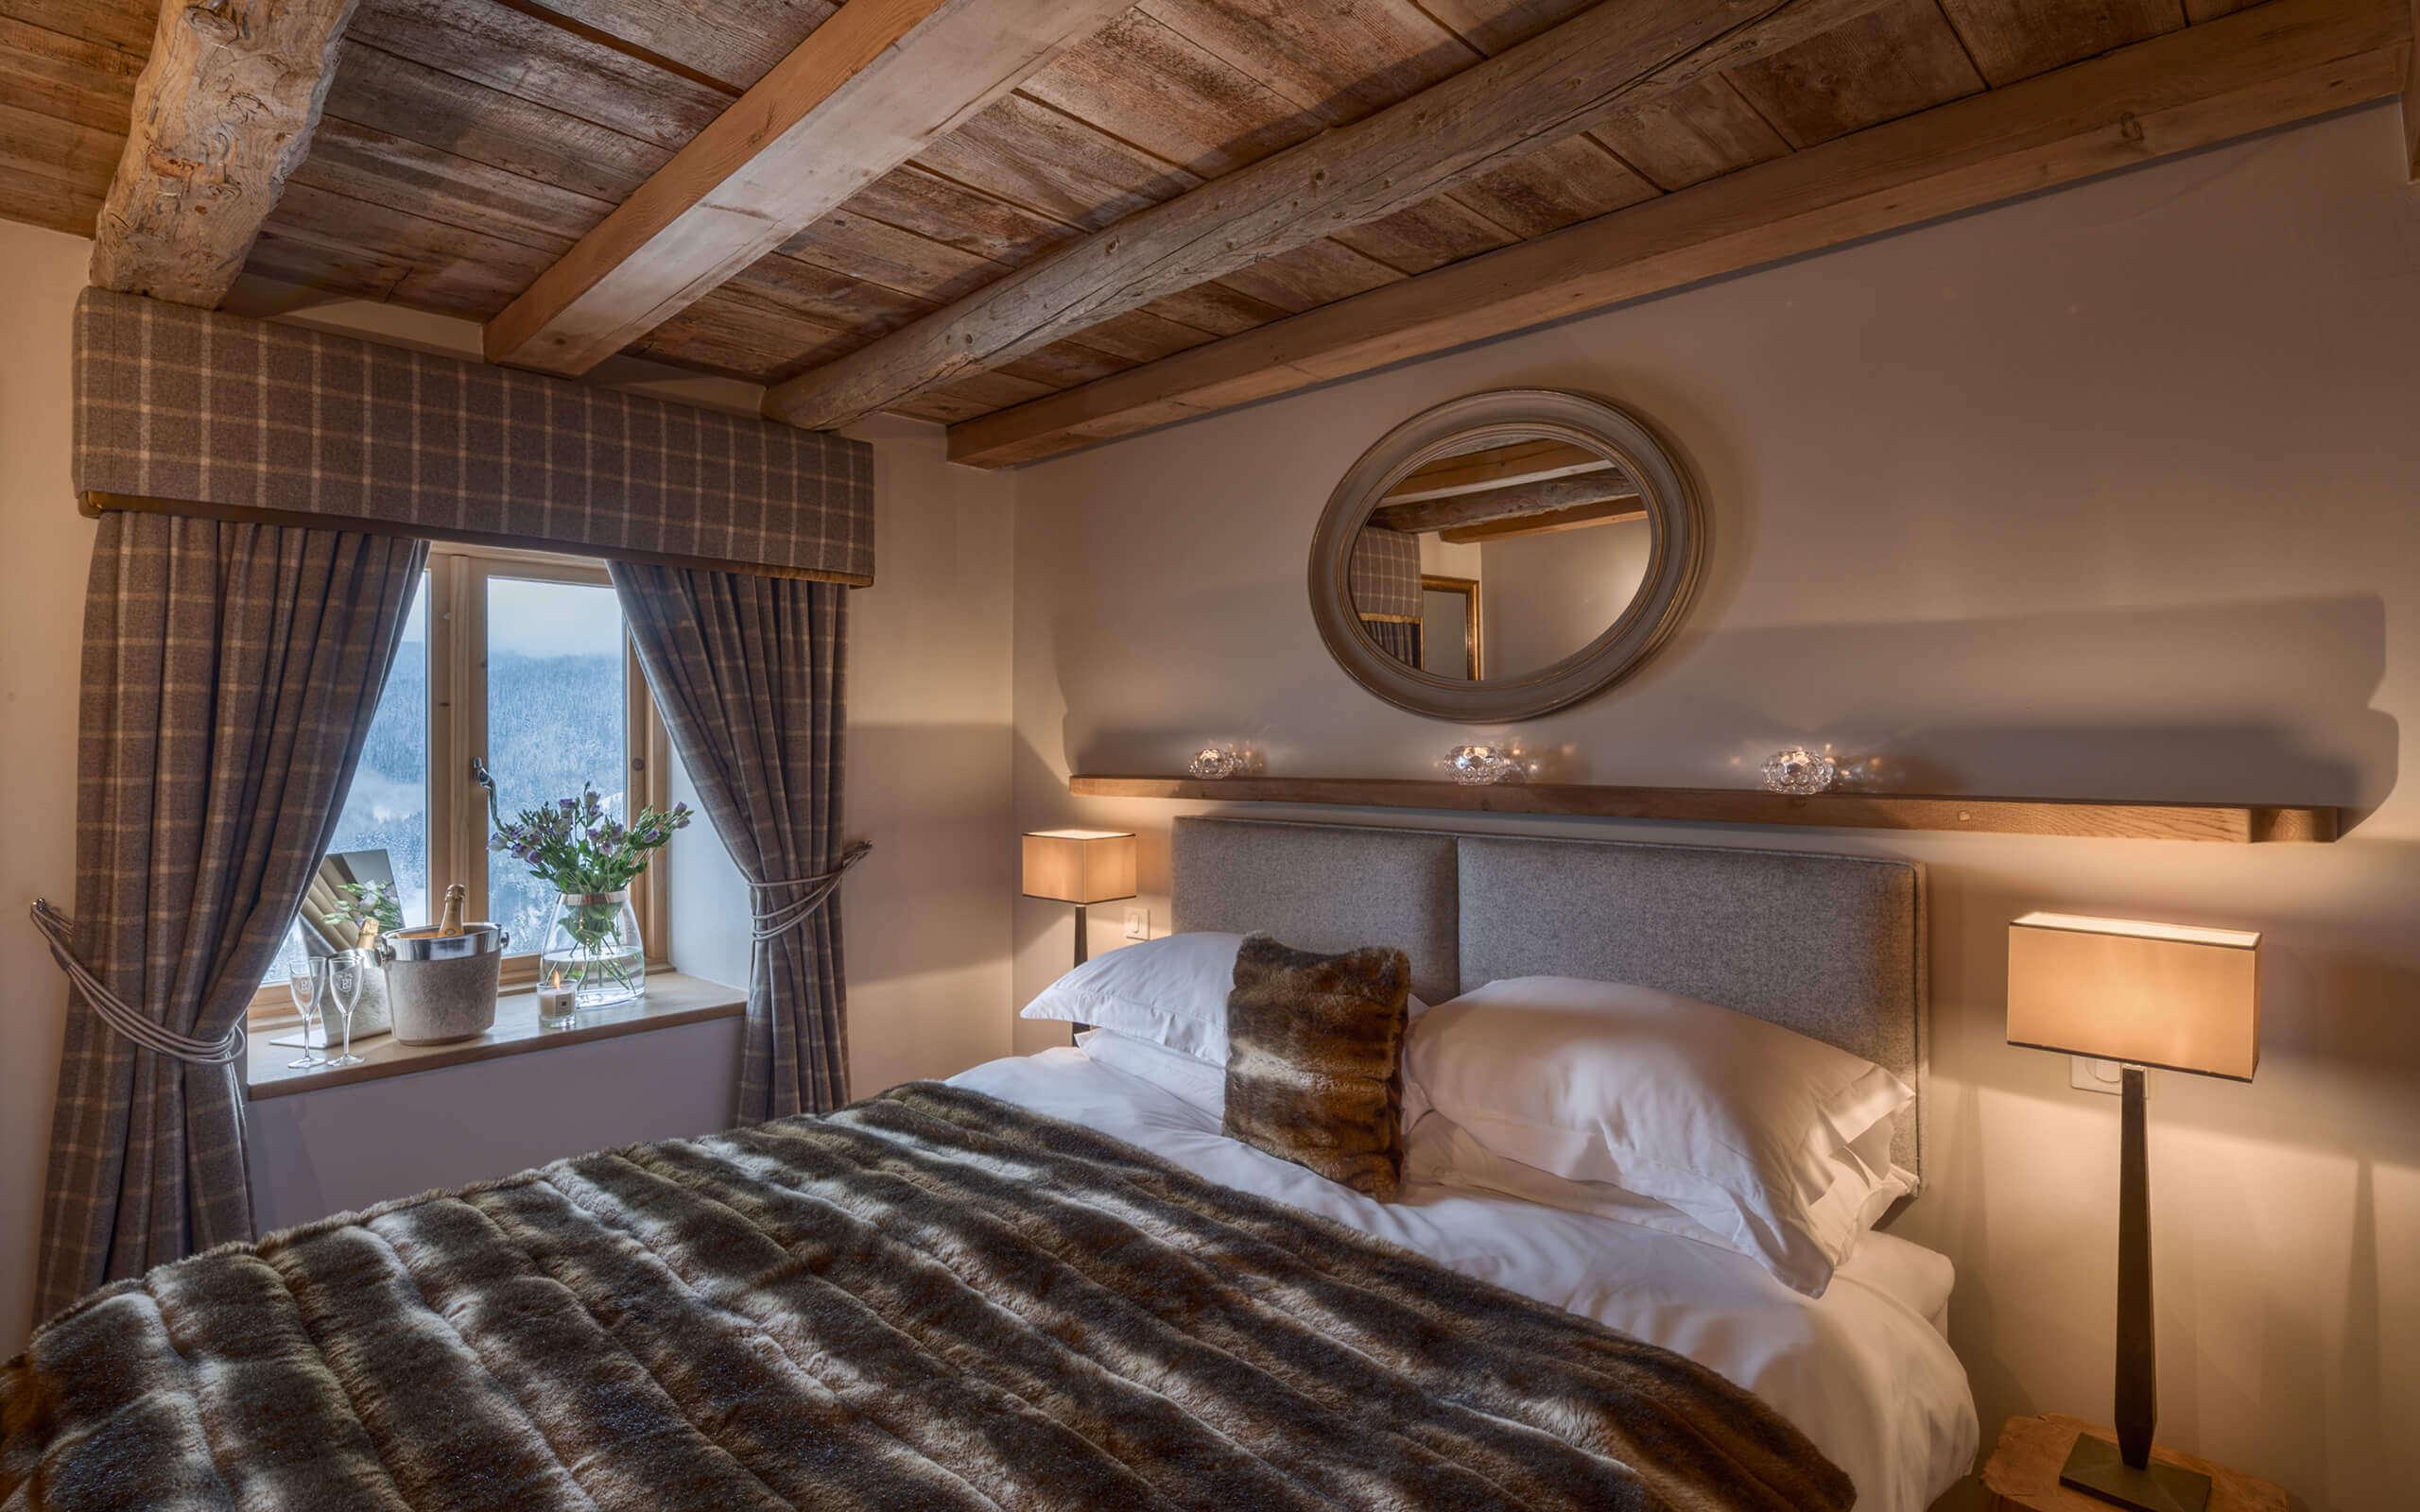 Petite Corniche Les Gets Bedroom